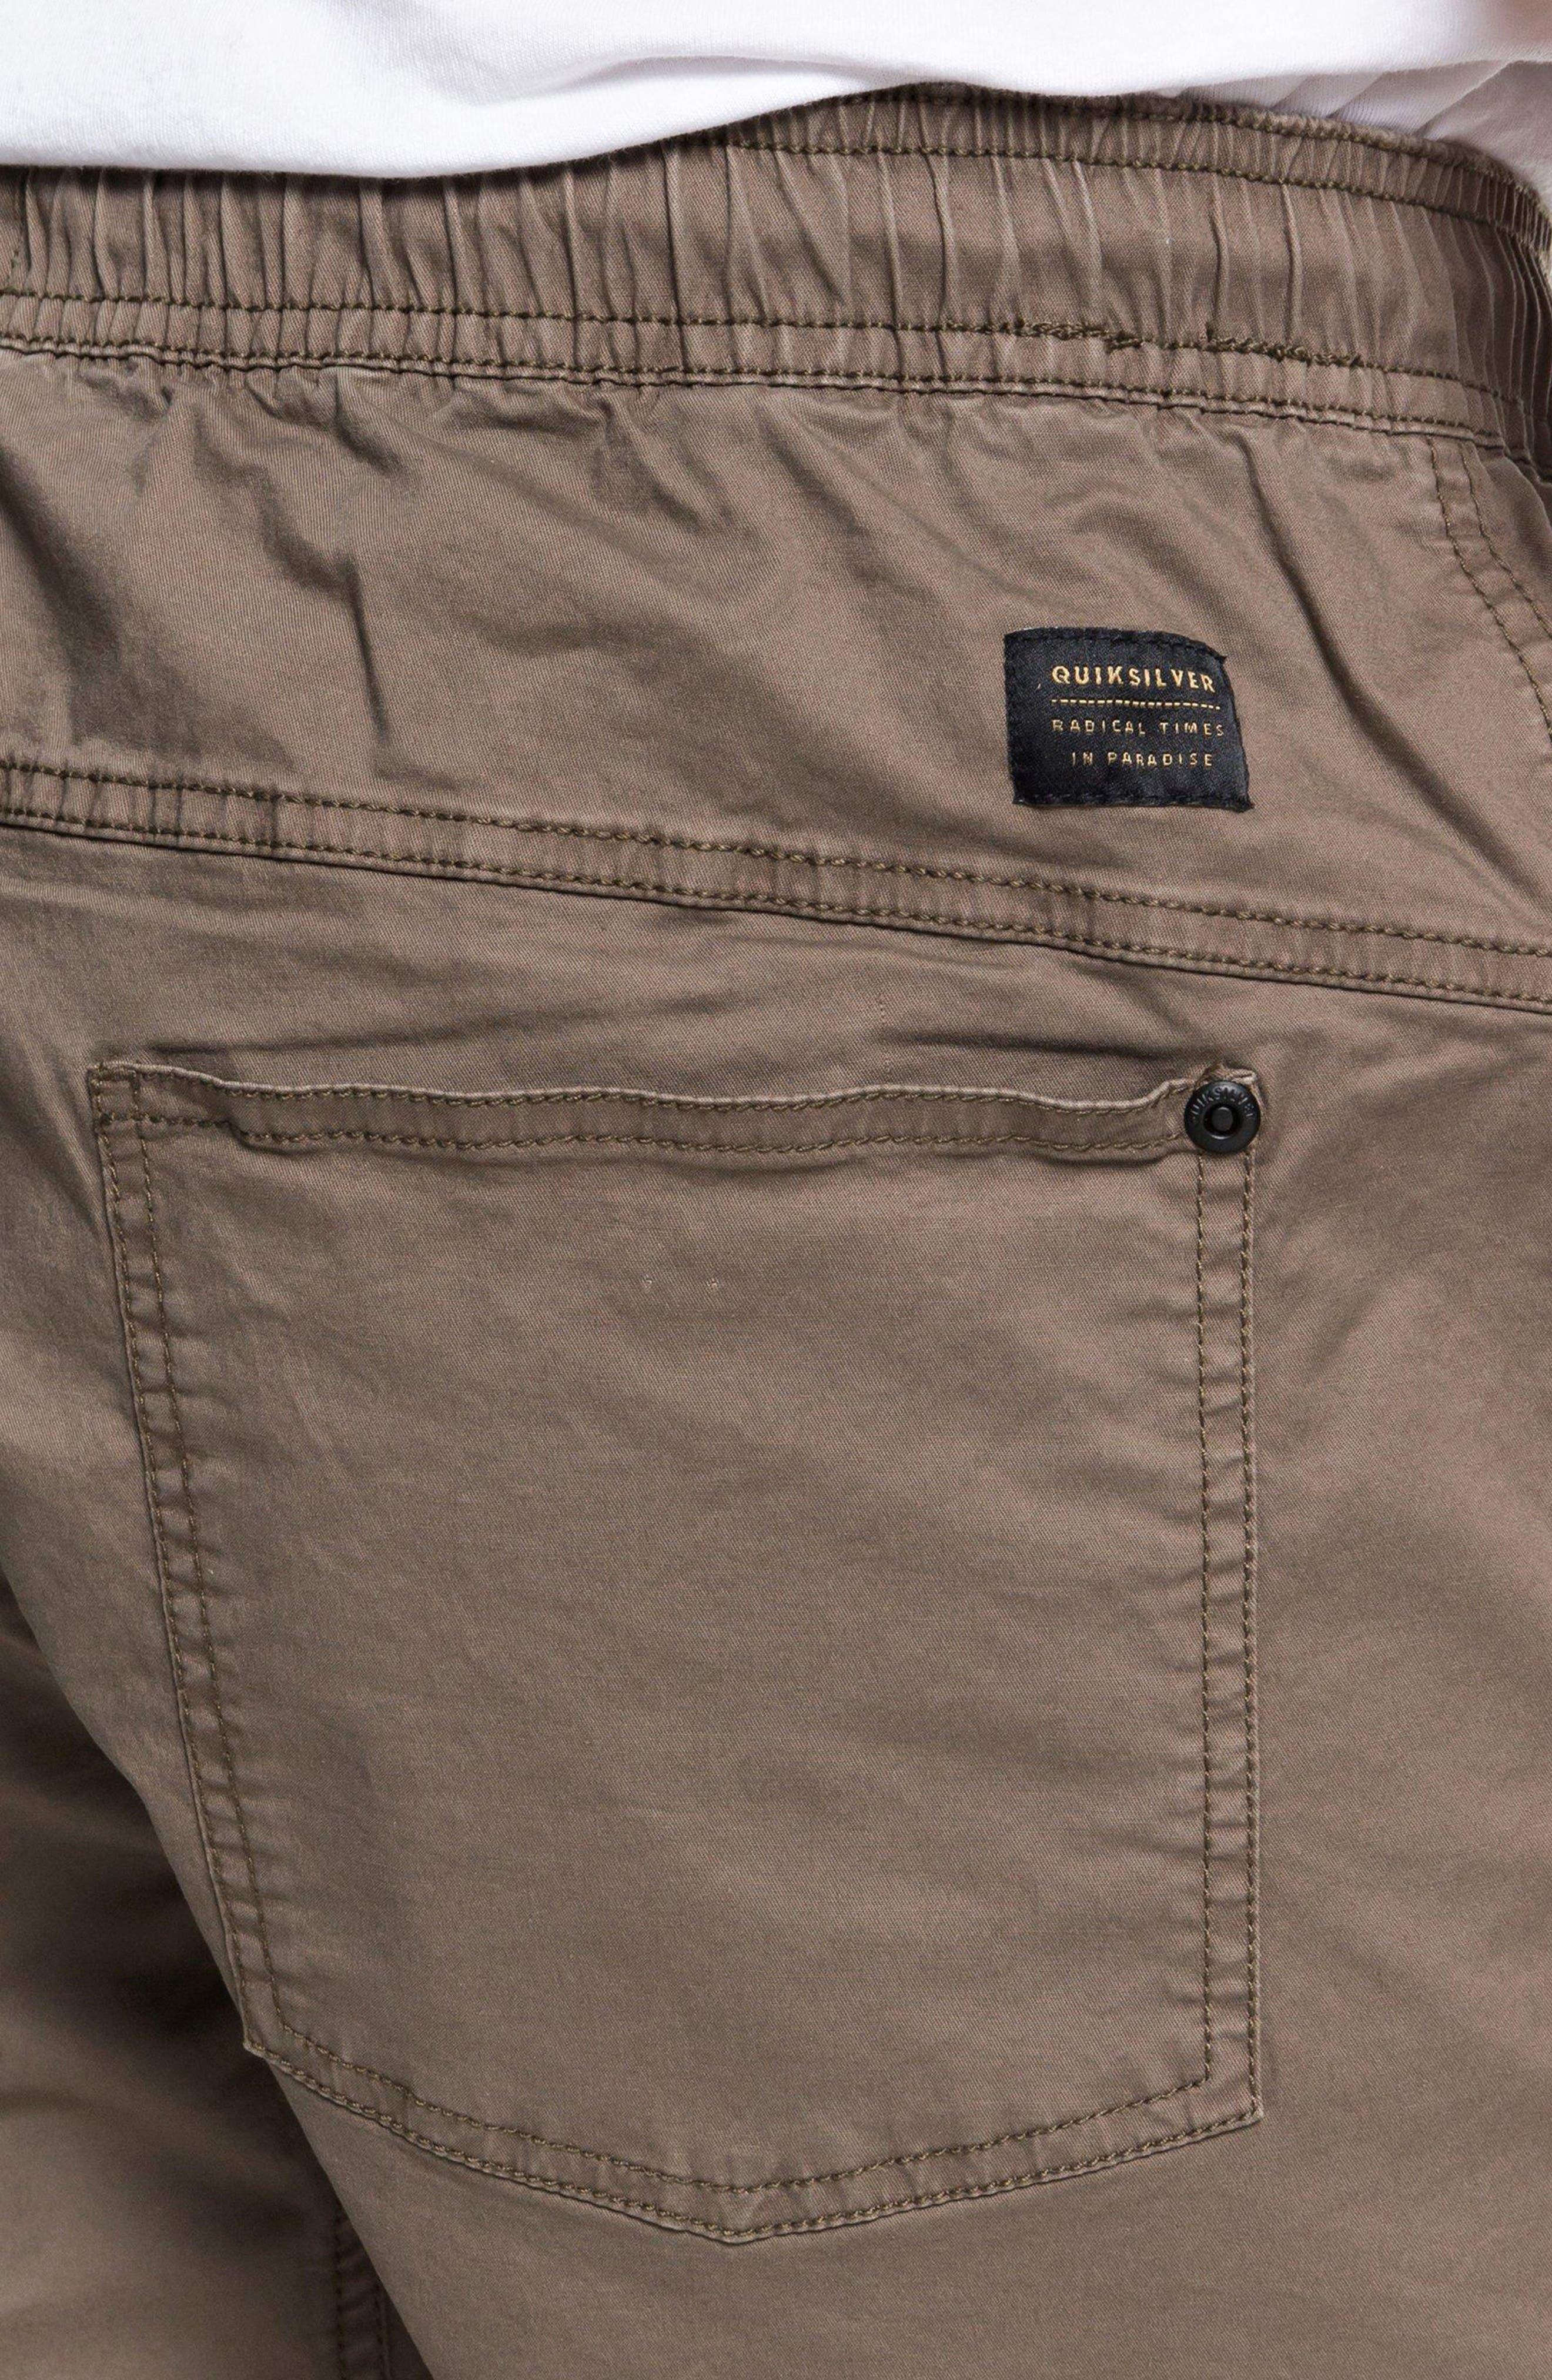 Foxoy Shorts,                             Alternate thumbnail 3, color,                             FALCON